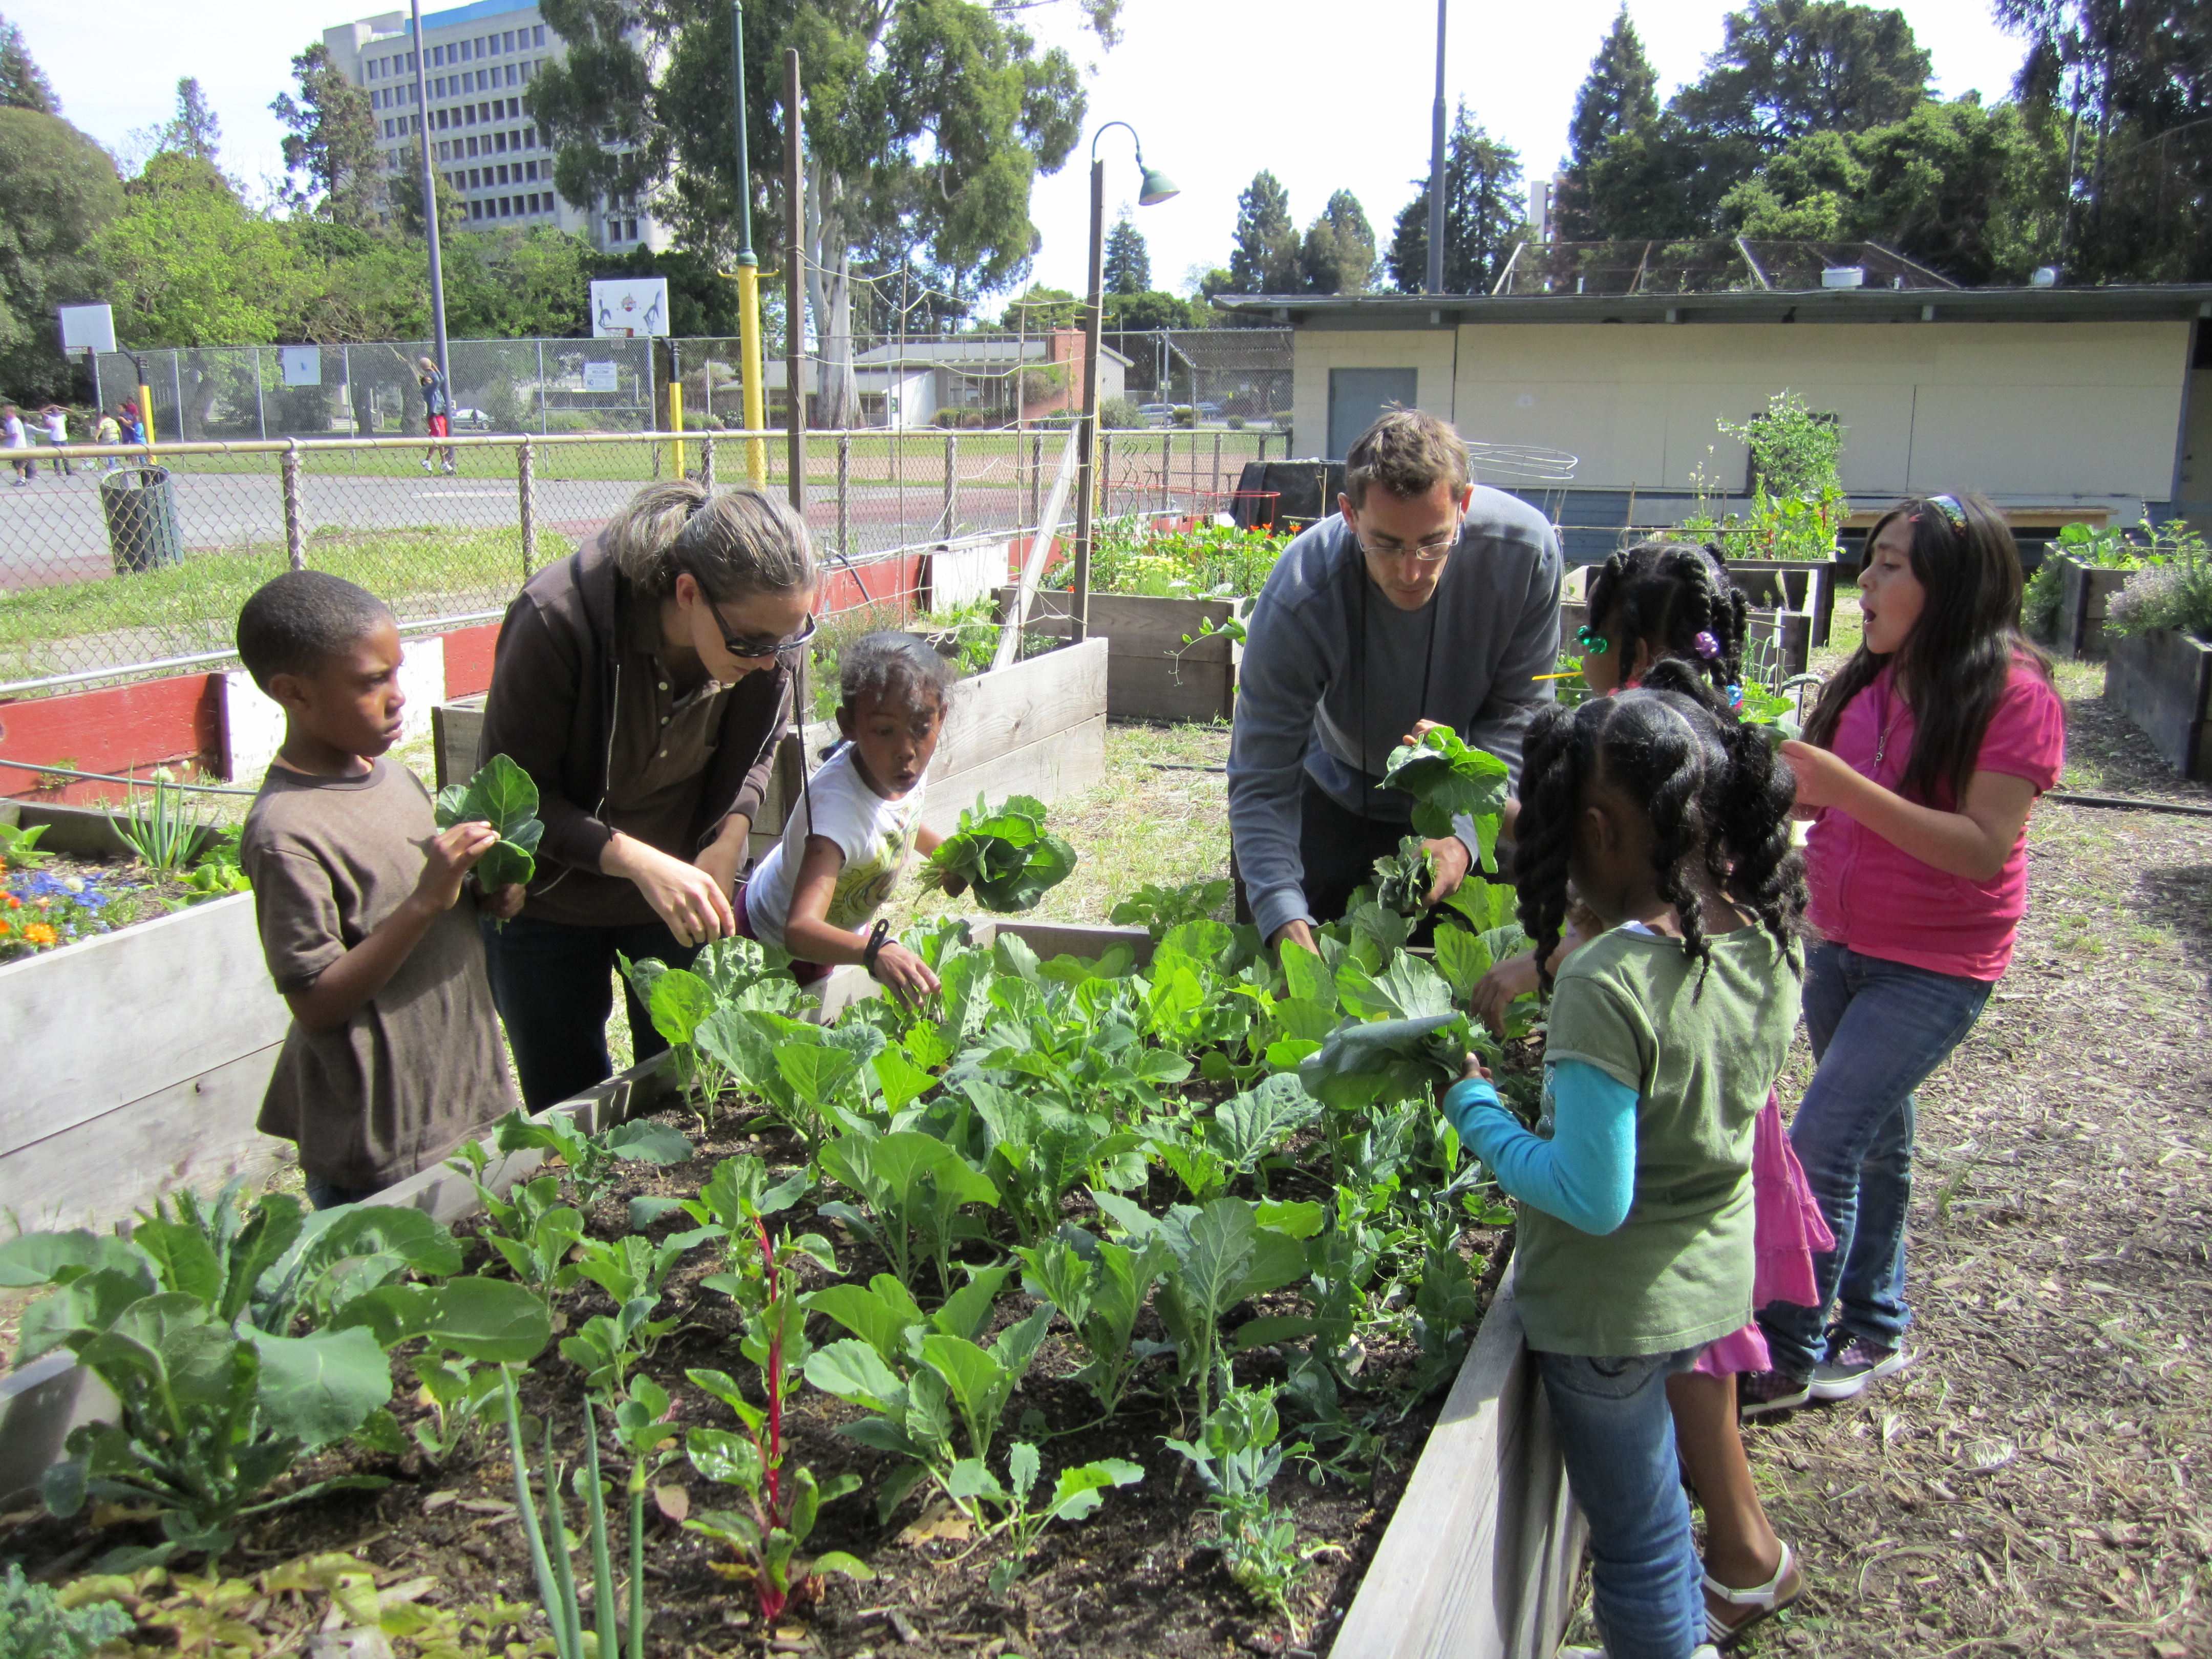 Gate clipart community garden Of Mosswood Thumbnail Community Programs